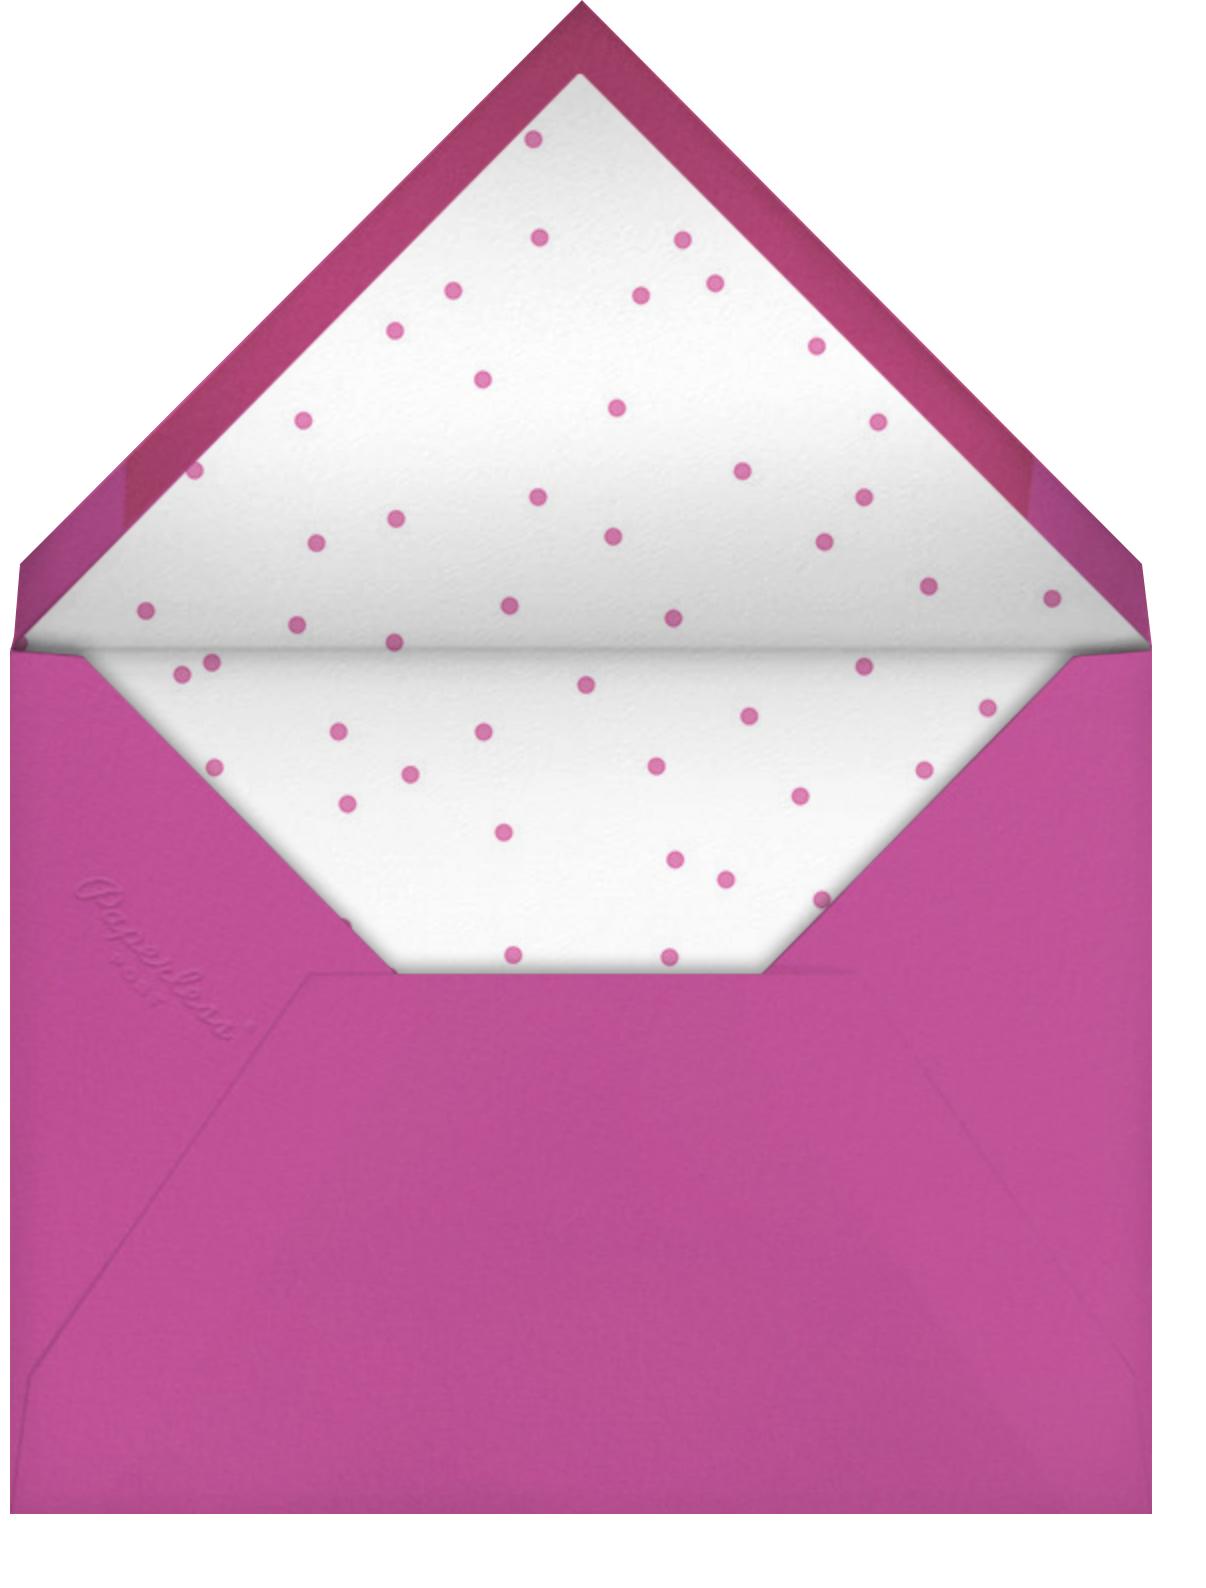 Daisy Days - Paella - kate spade new york - Baby shower - envelope back